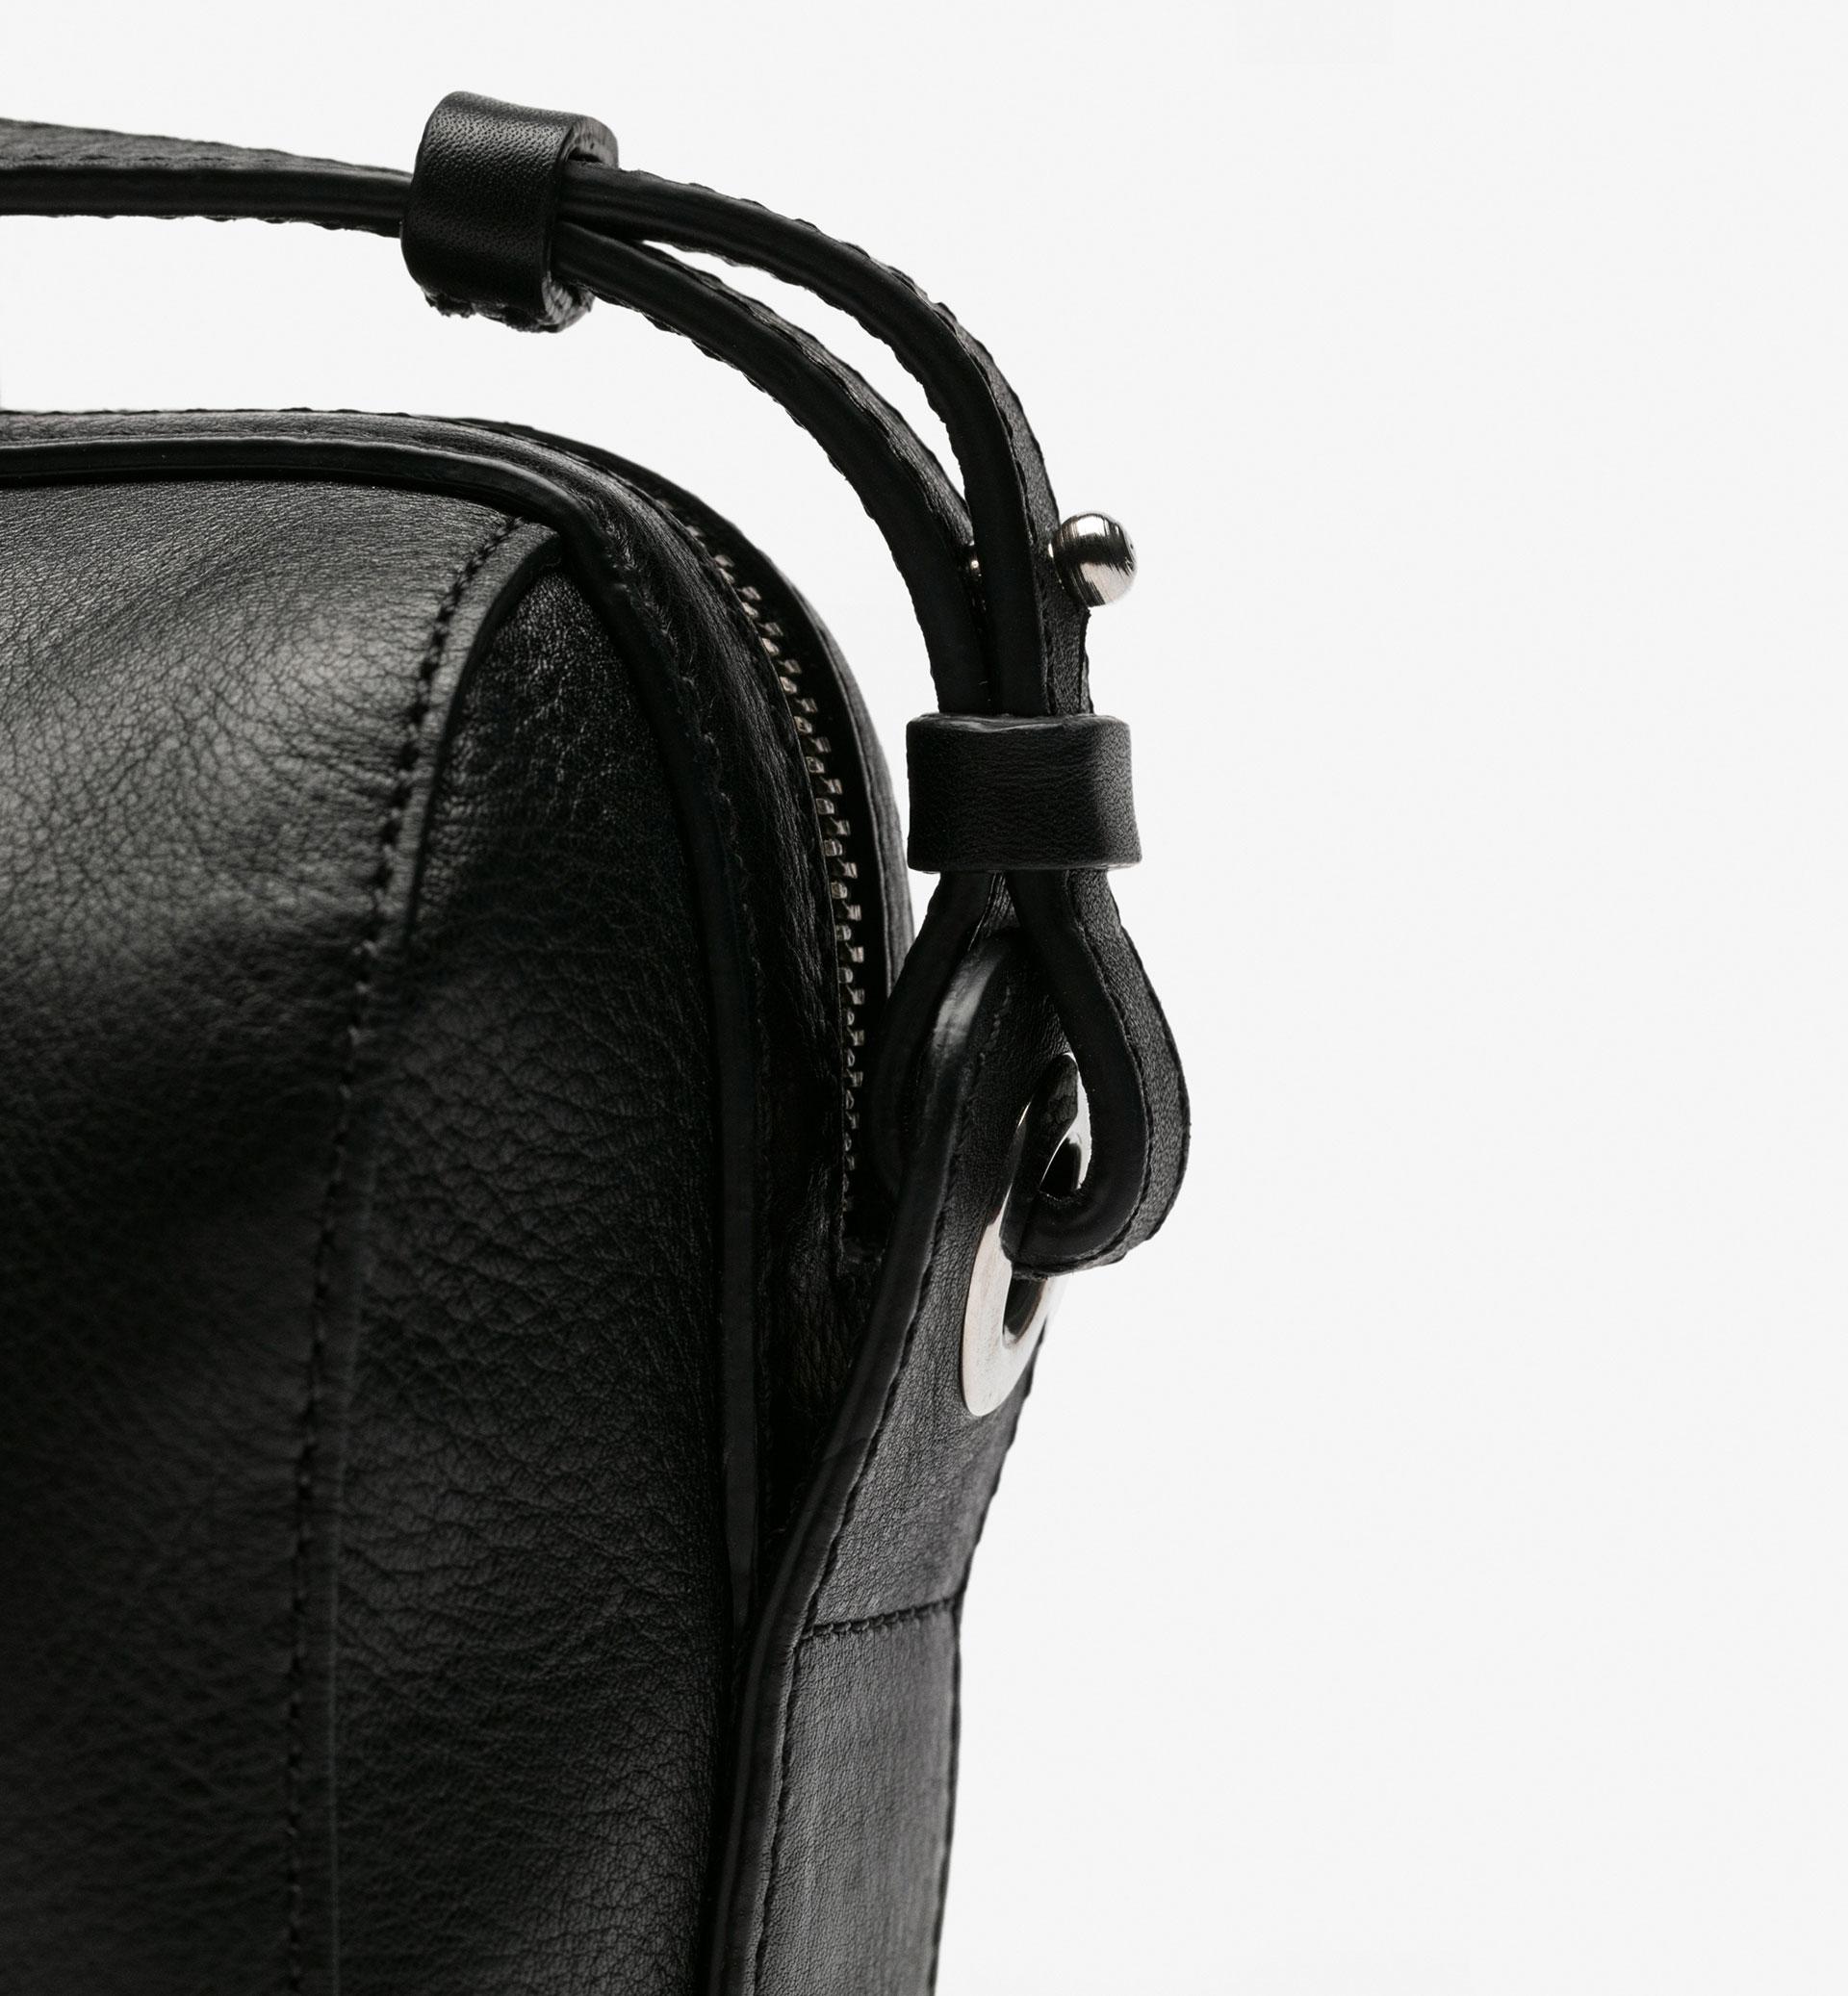 MINI BOWLING BAG WITH APPLIQUÉS